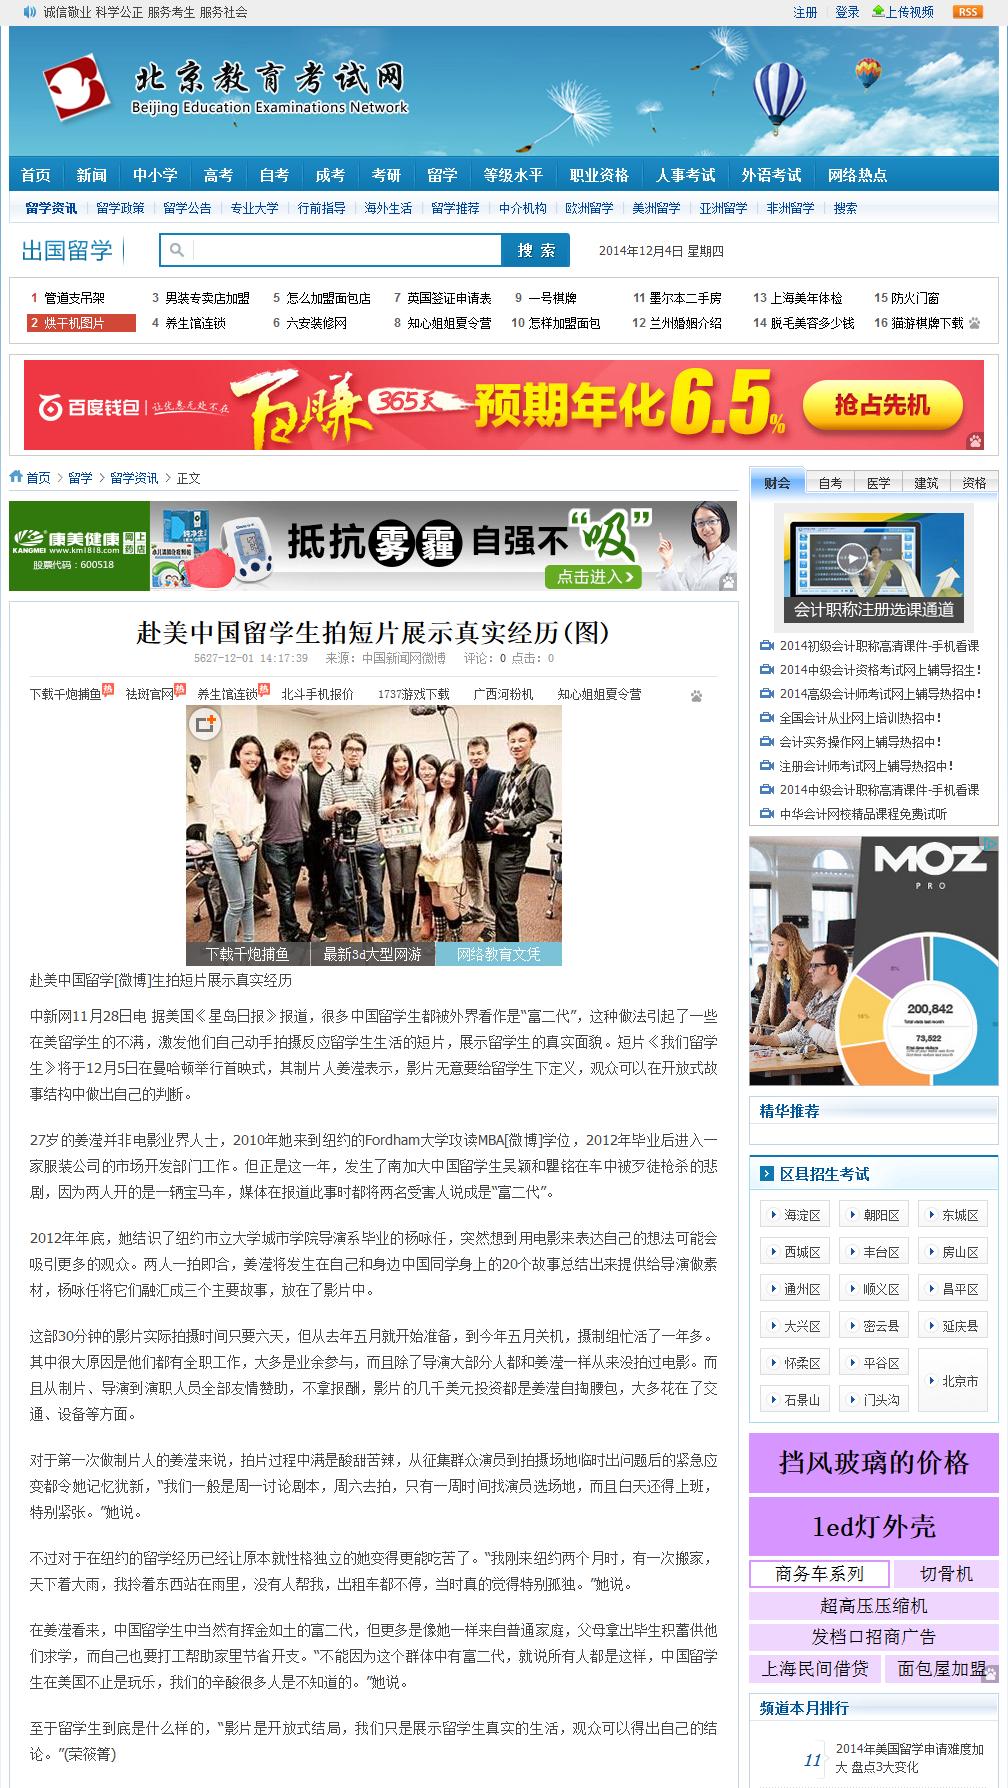 Beijing Education Examinations Network 12/1 report